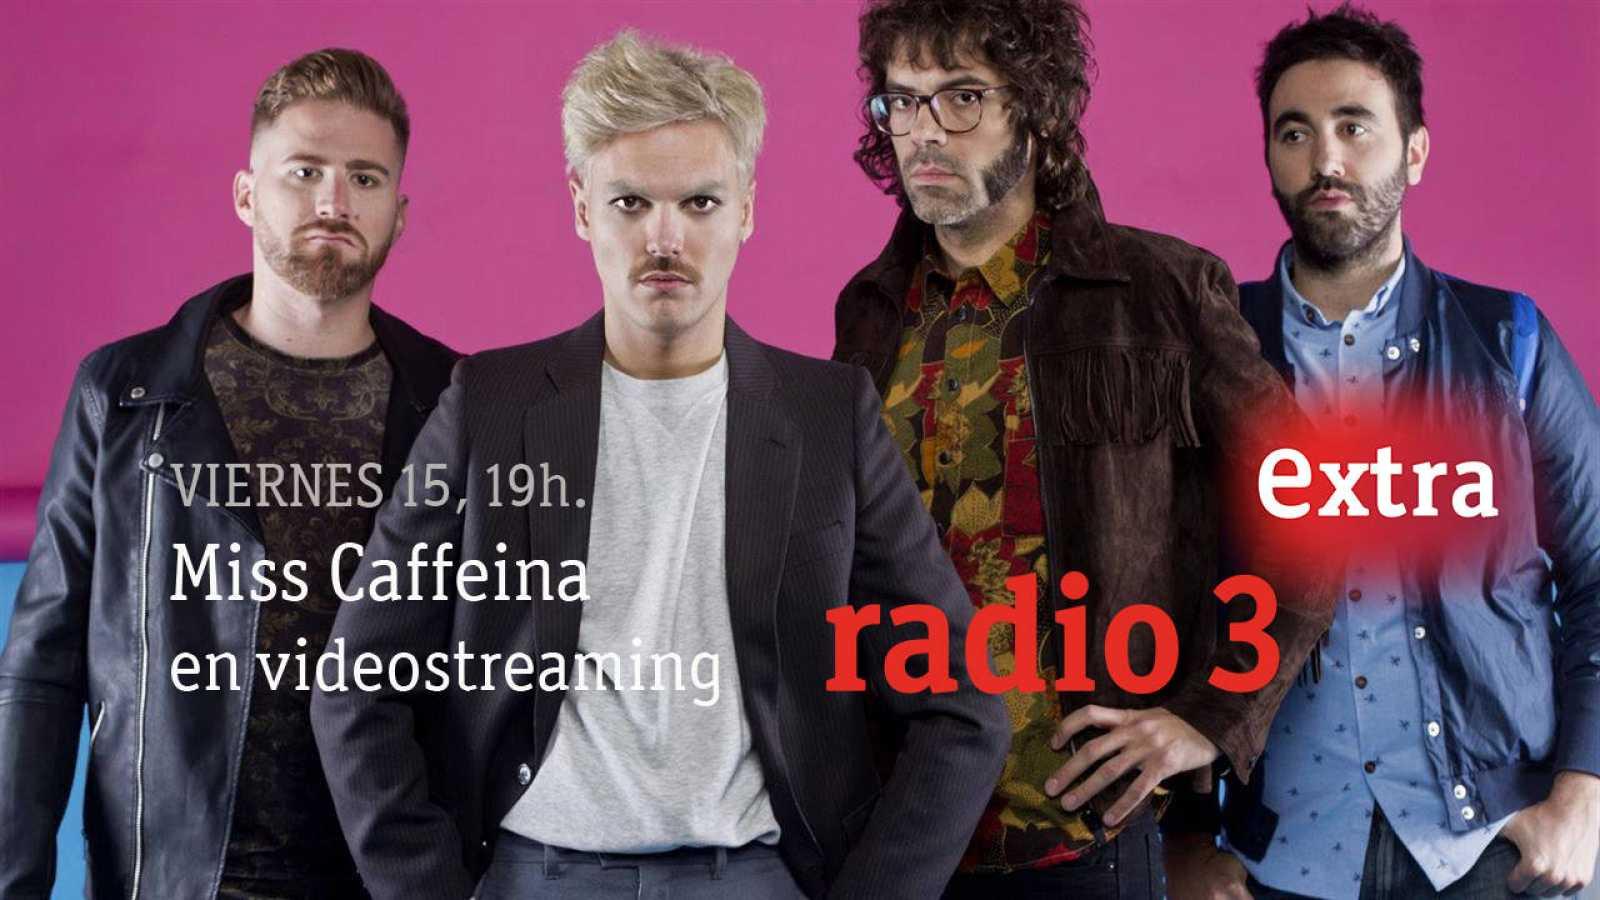 Web o app, elige dónde vas a ver esta tarde Miss Caffeina en vídeo en Radio 3 Extra.º